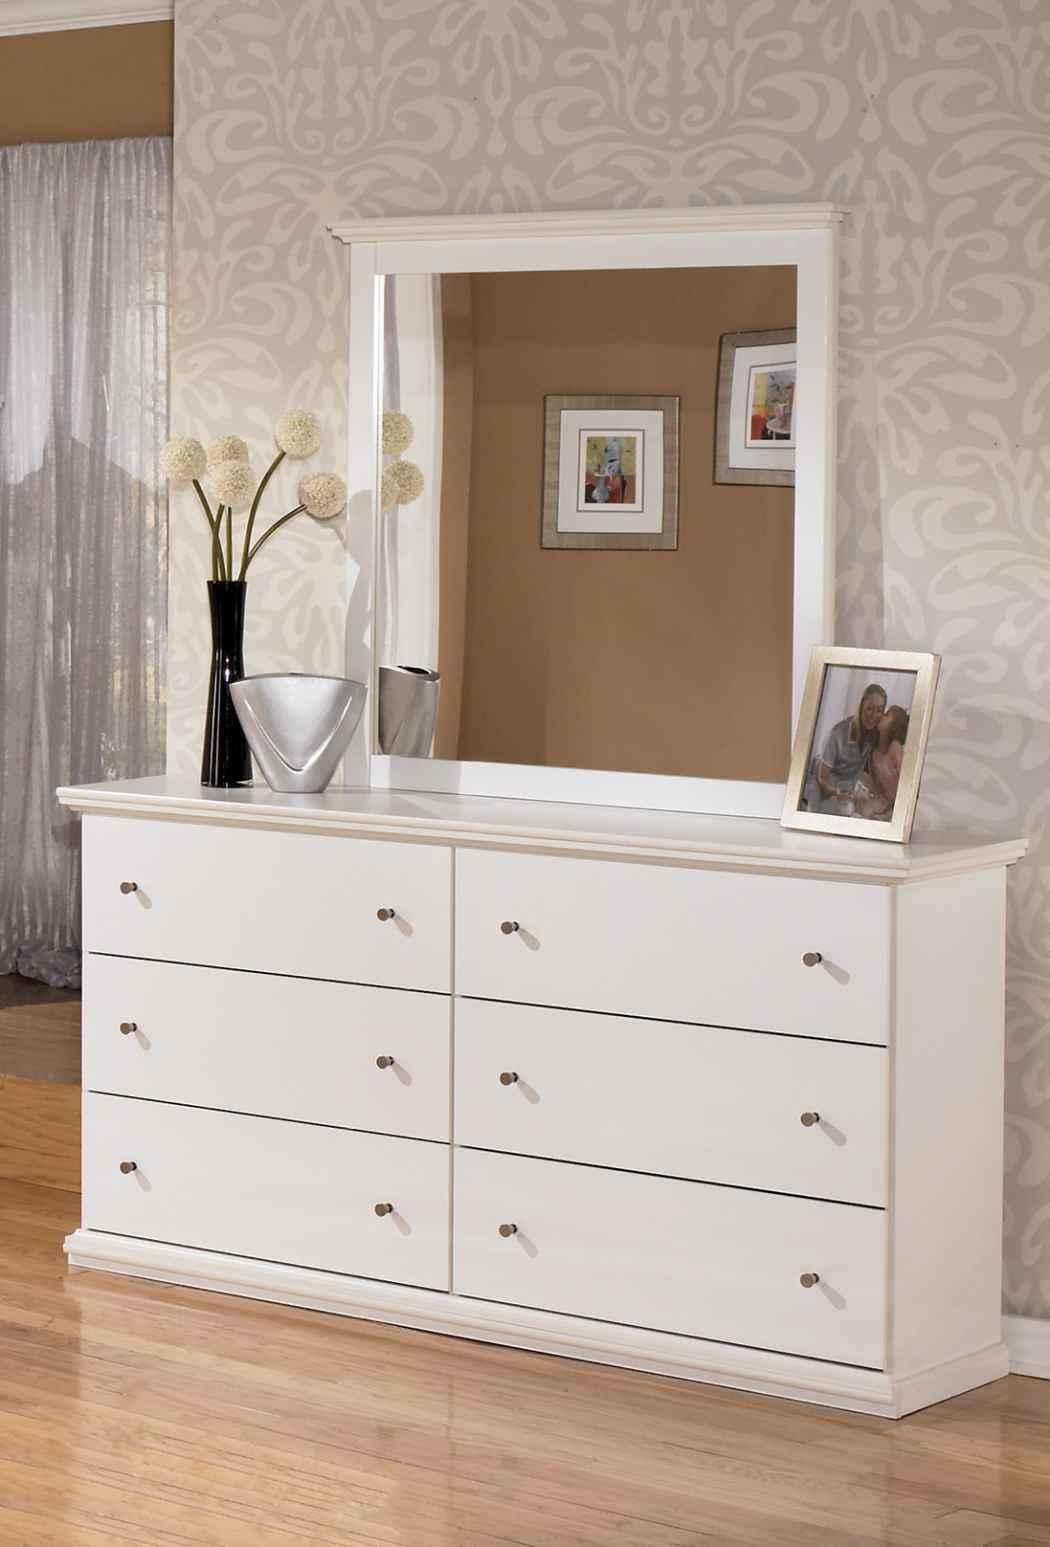 Bostwick Shoals Solid White Cottage Style Bedroom Set. Bostwick Shoals Solid White Cottage Style Bedroom Set   Marjen of